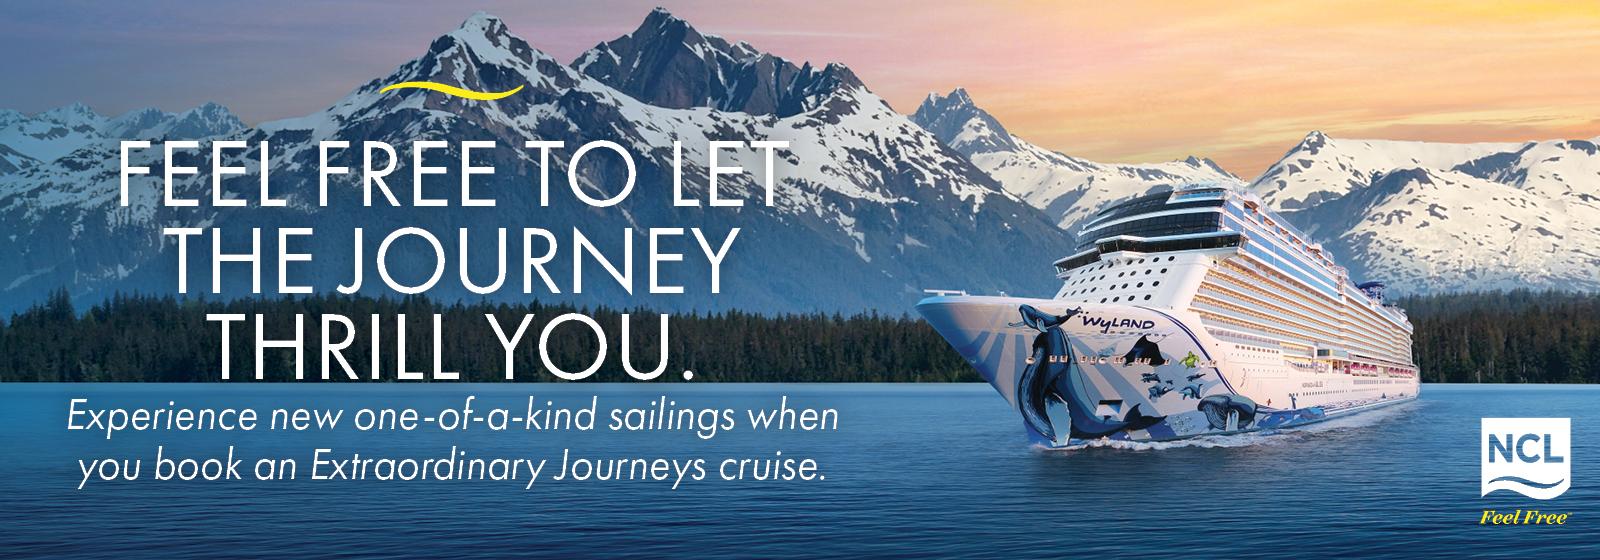 Norwegian Cruise Line - Extraordinary Journeys